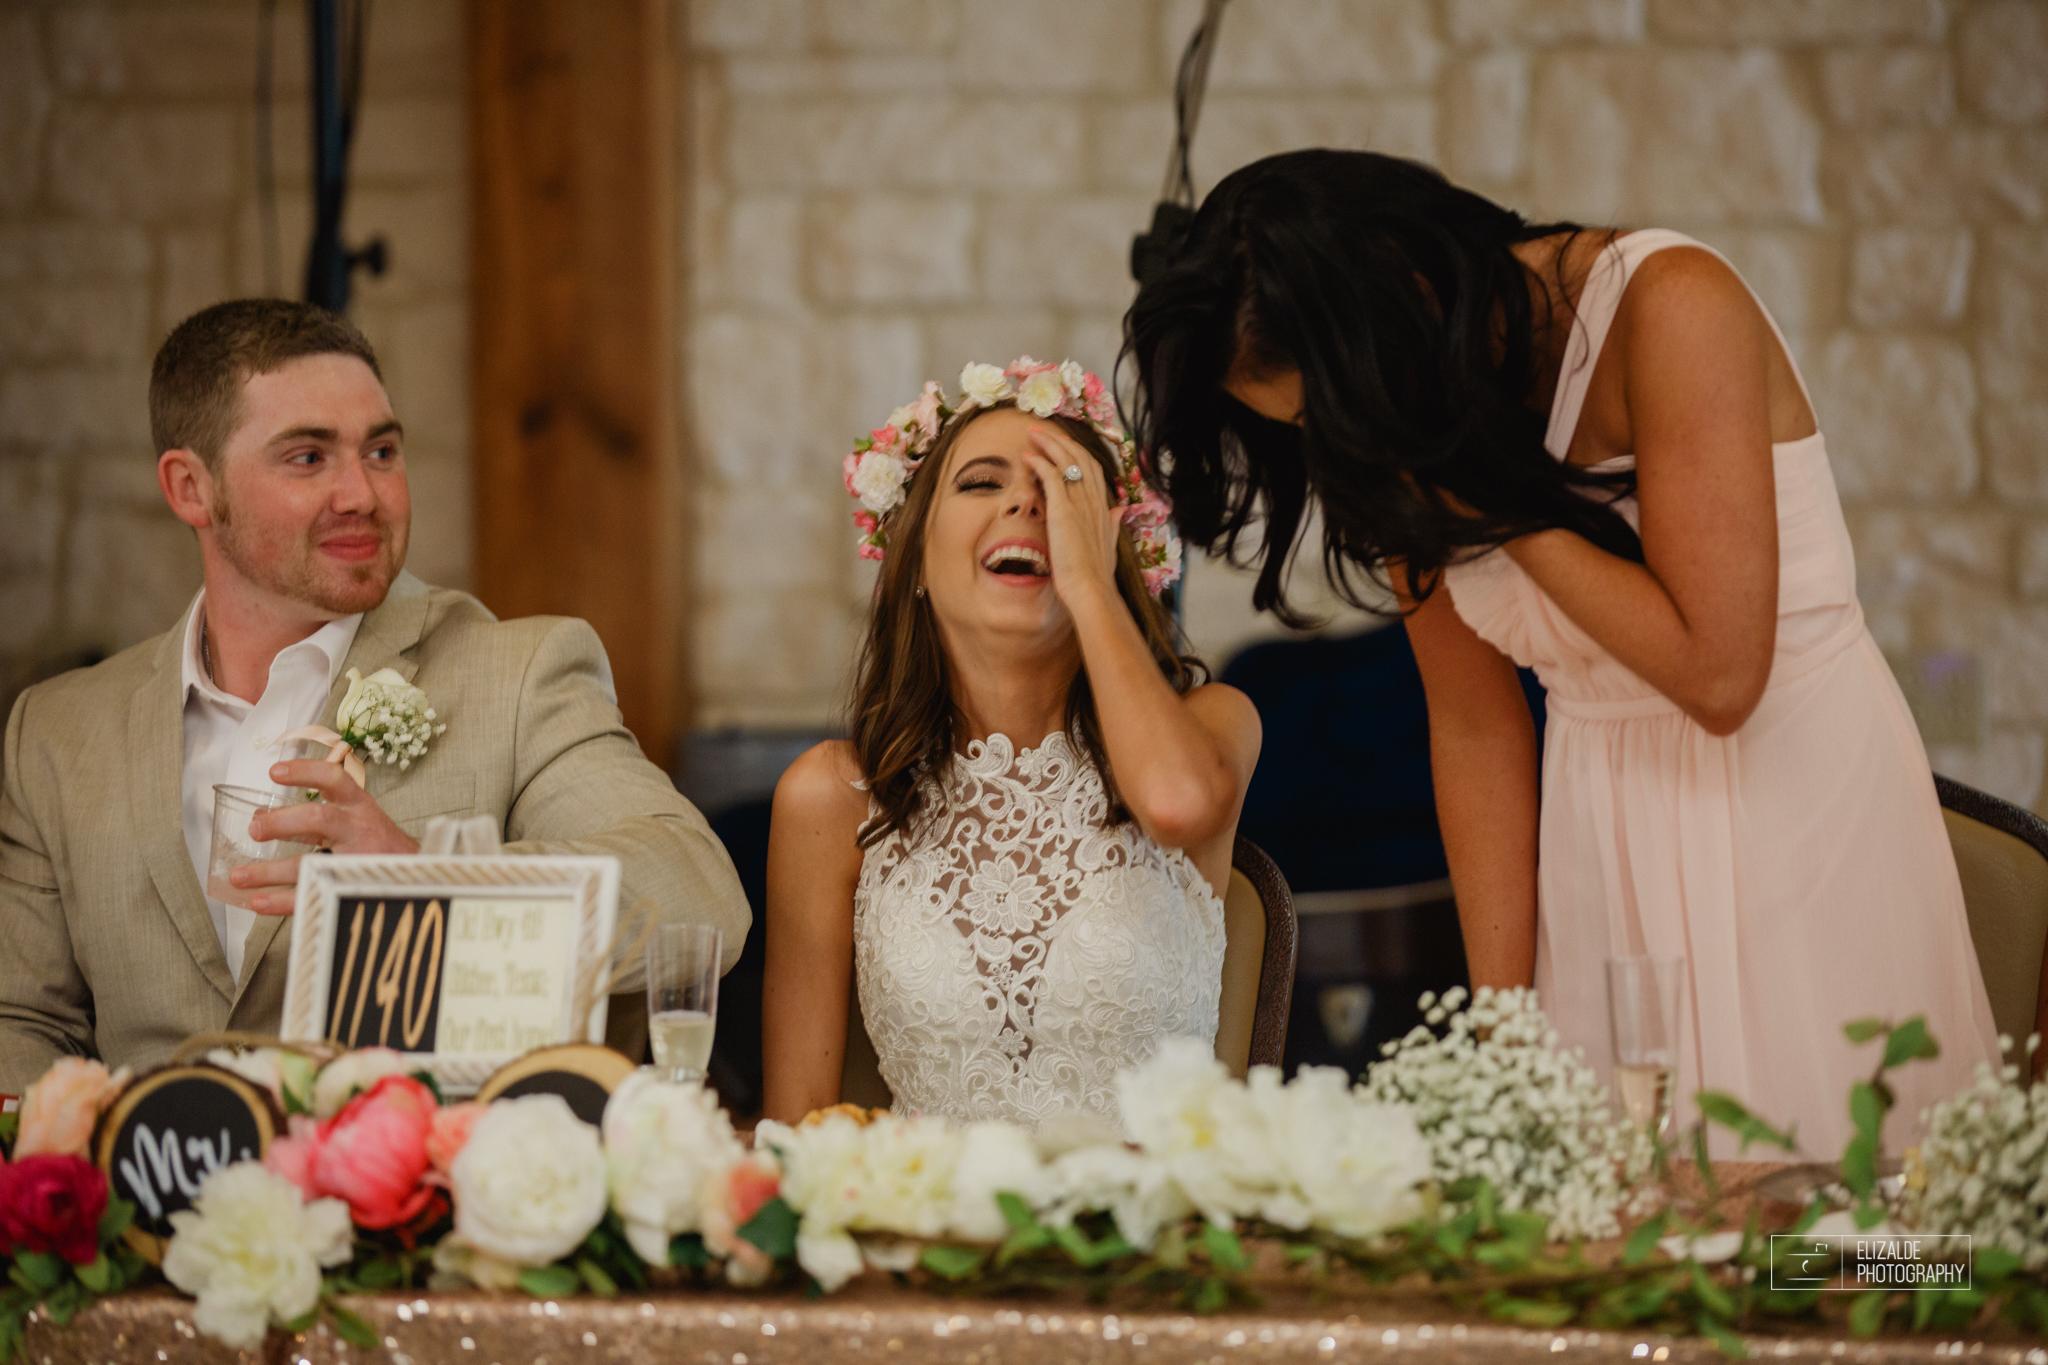 Wedding photographer Dallas_Elizalde Photography_DFW Wedding photographer_ Hickoty Hills_Wedding Photography (77 of 90).jpg